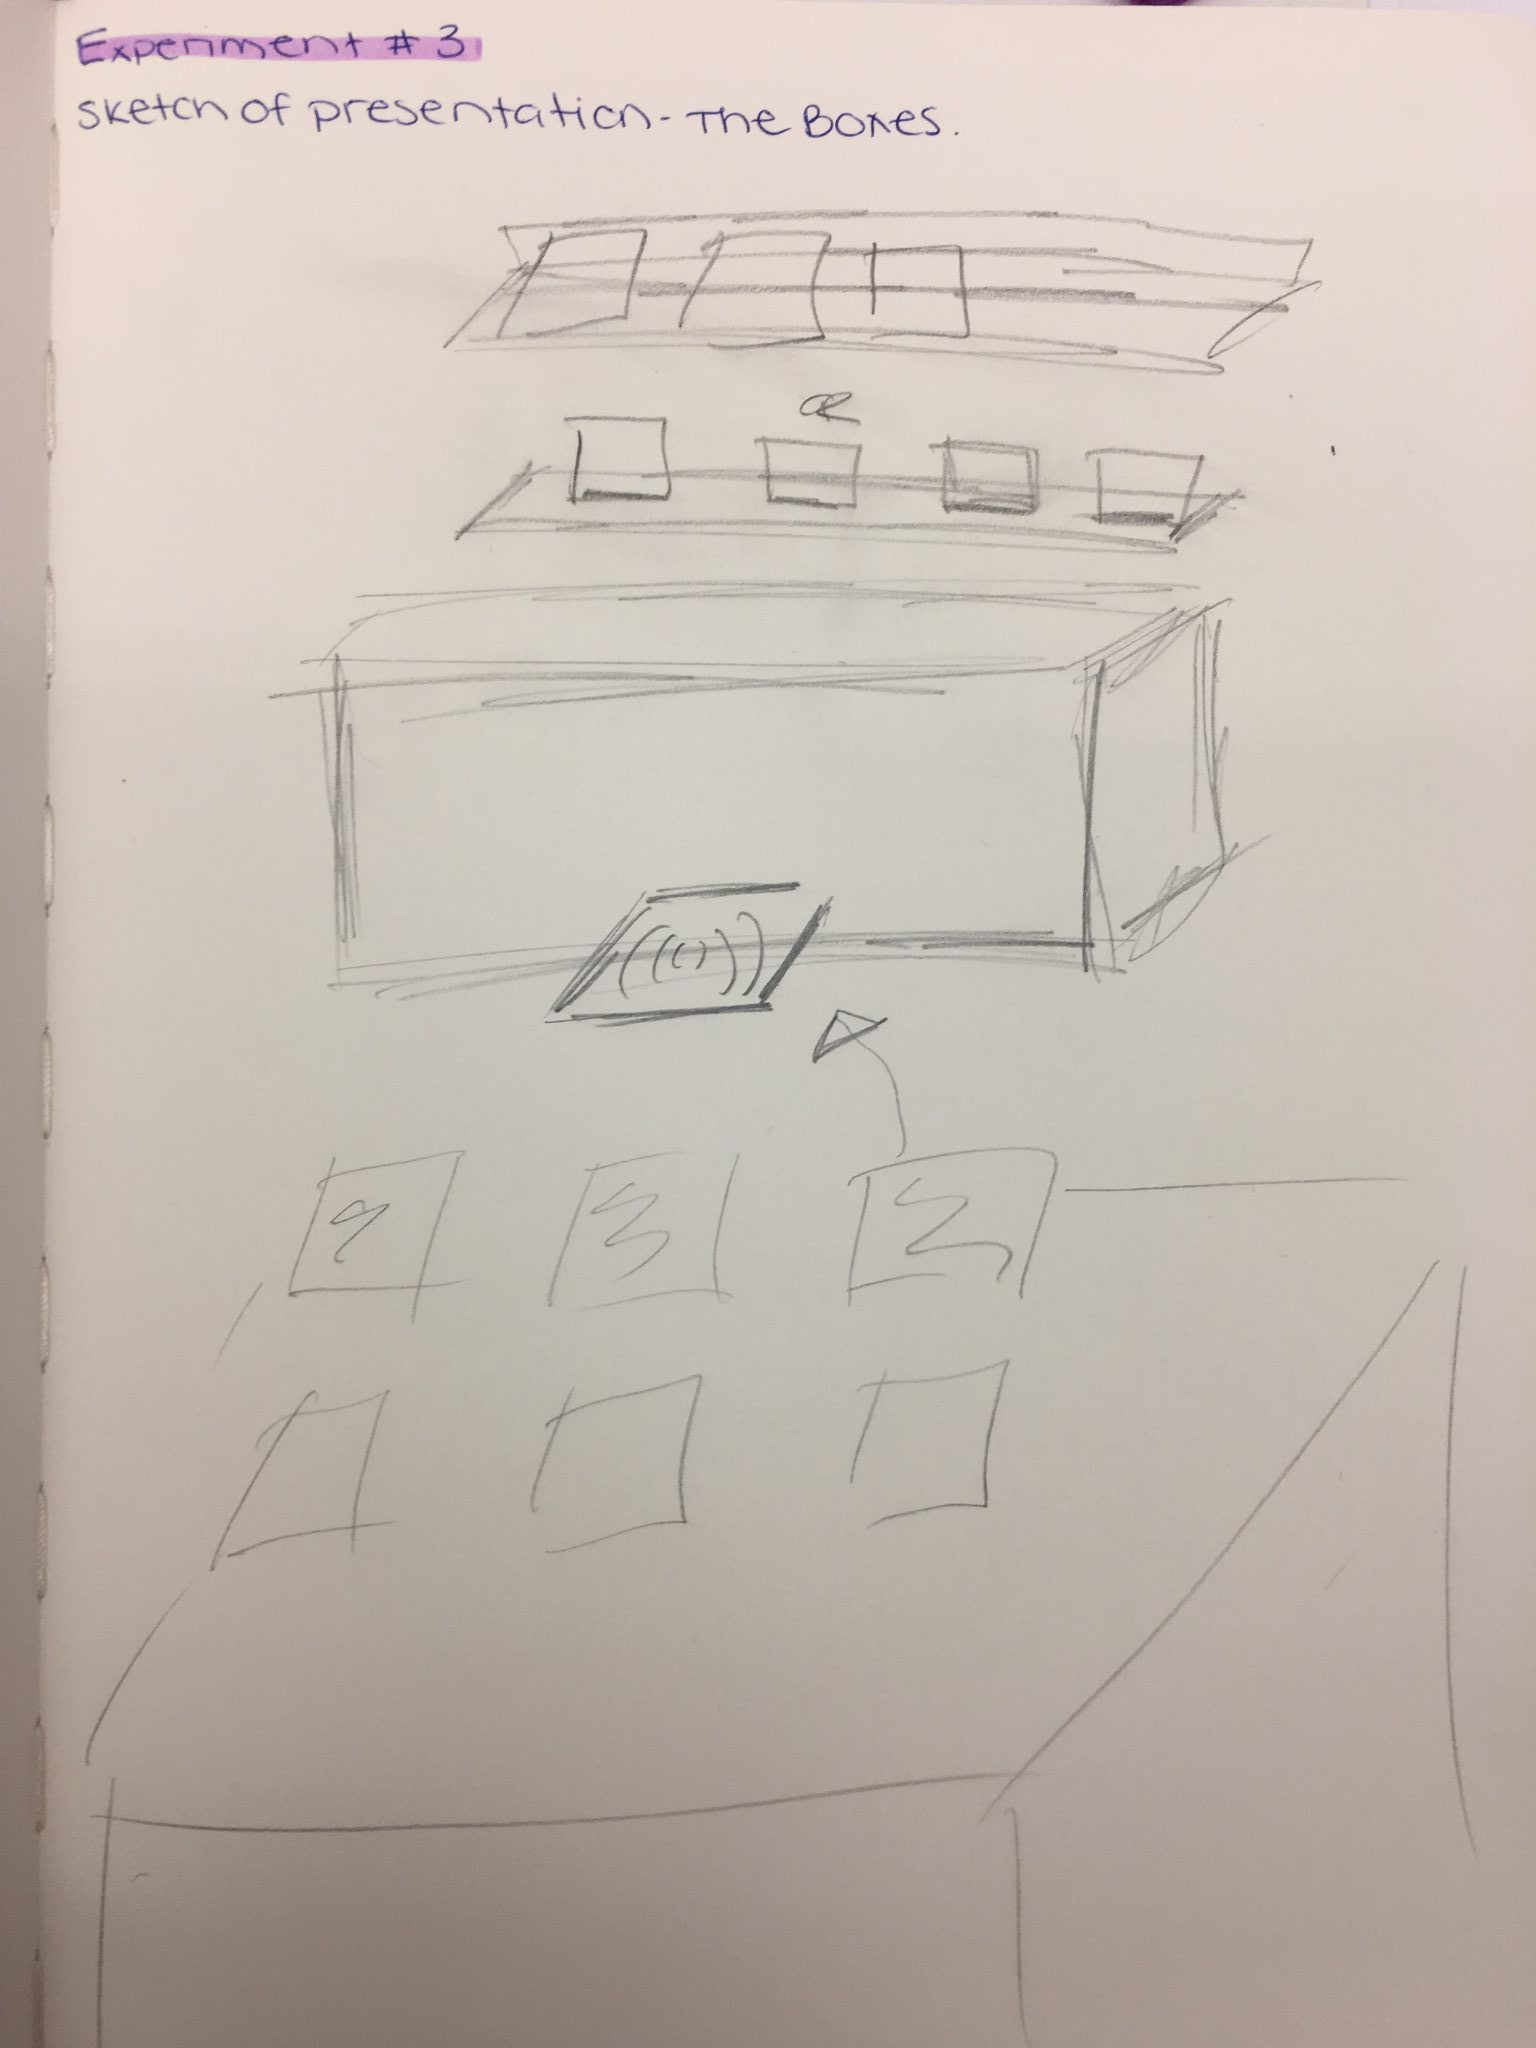 sketch-of-presentation